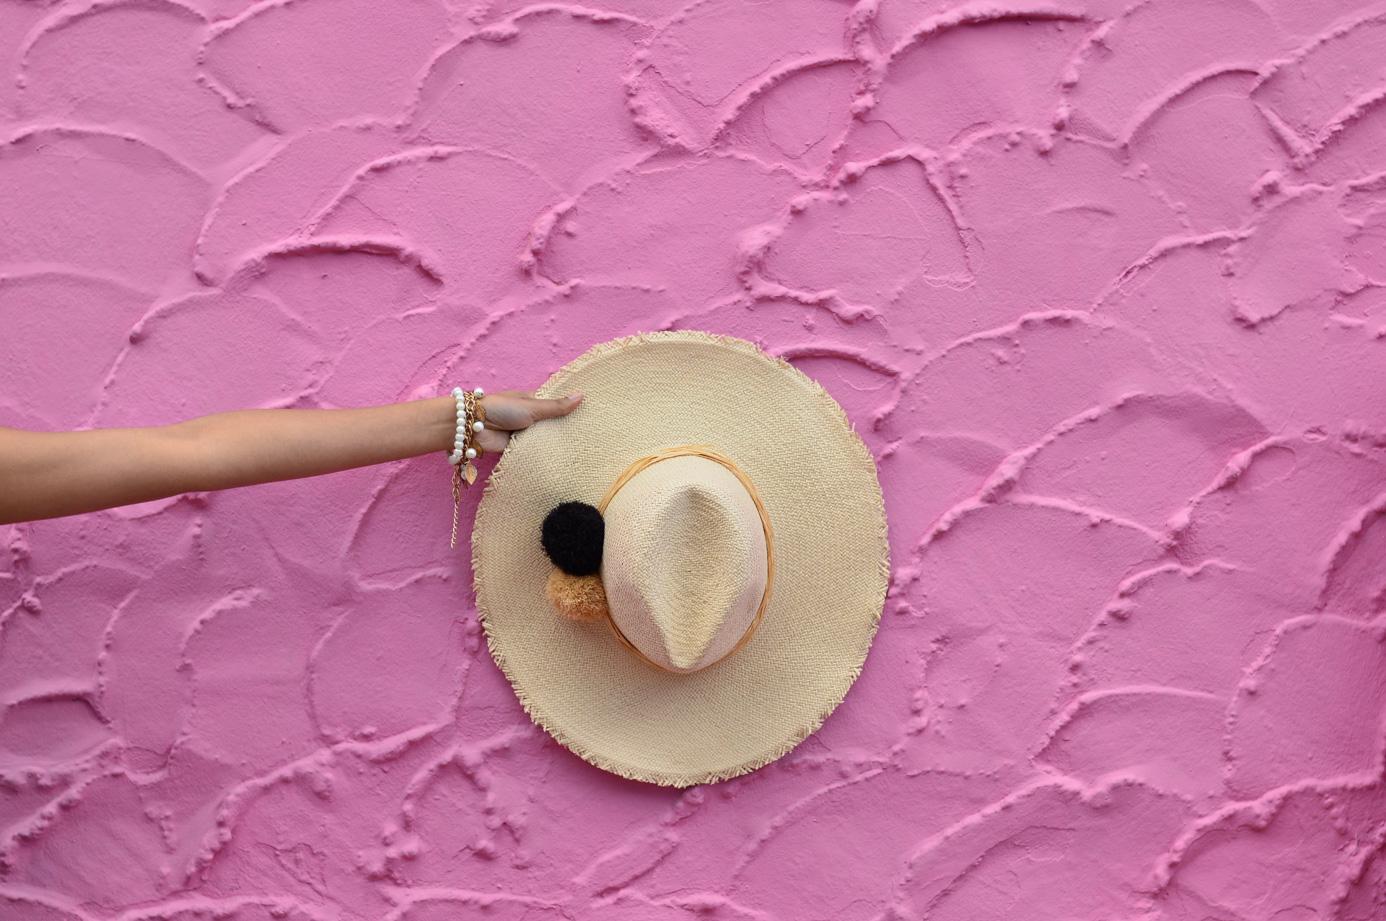 ikat-dress-blue-summer-style-capitola-california-hat-poms 5